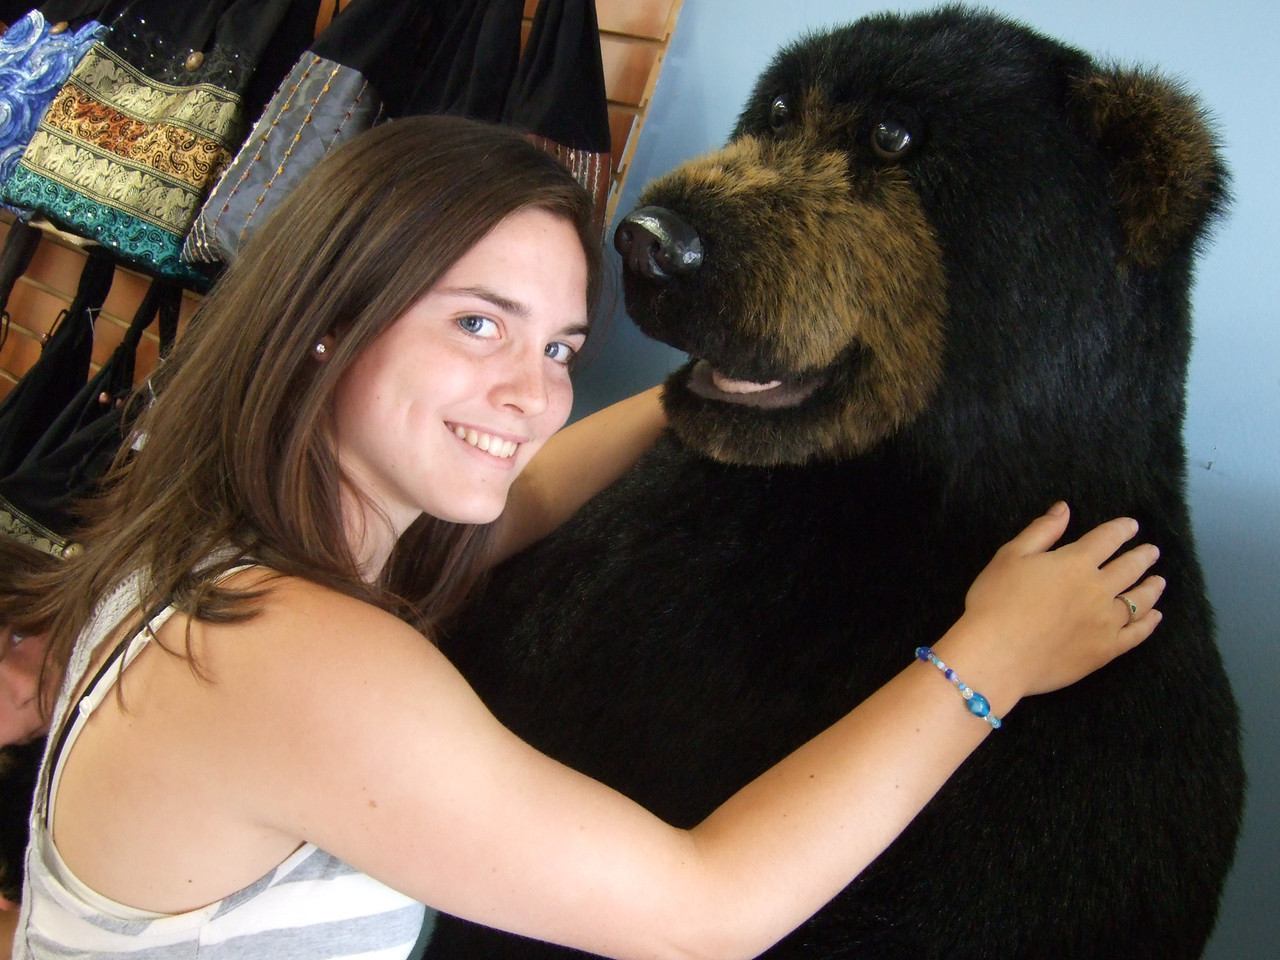 DSCF9279 Kristin and bear